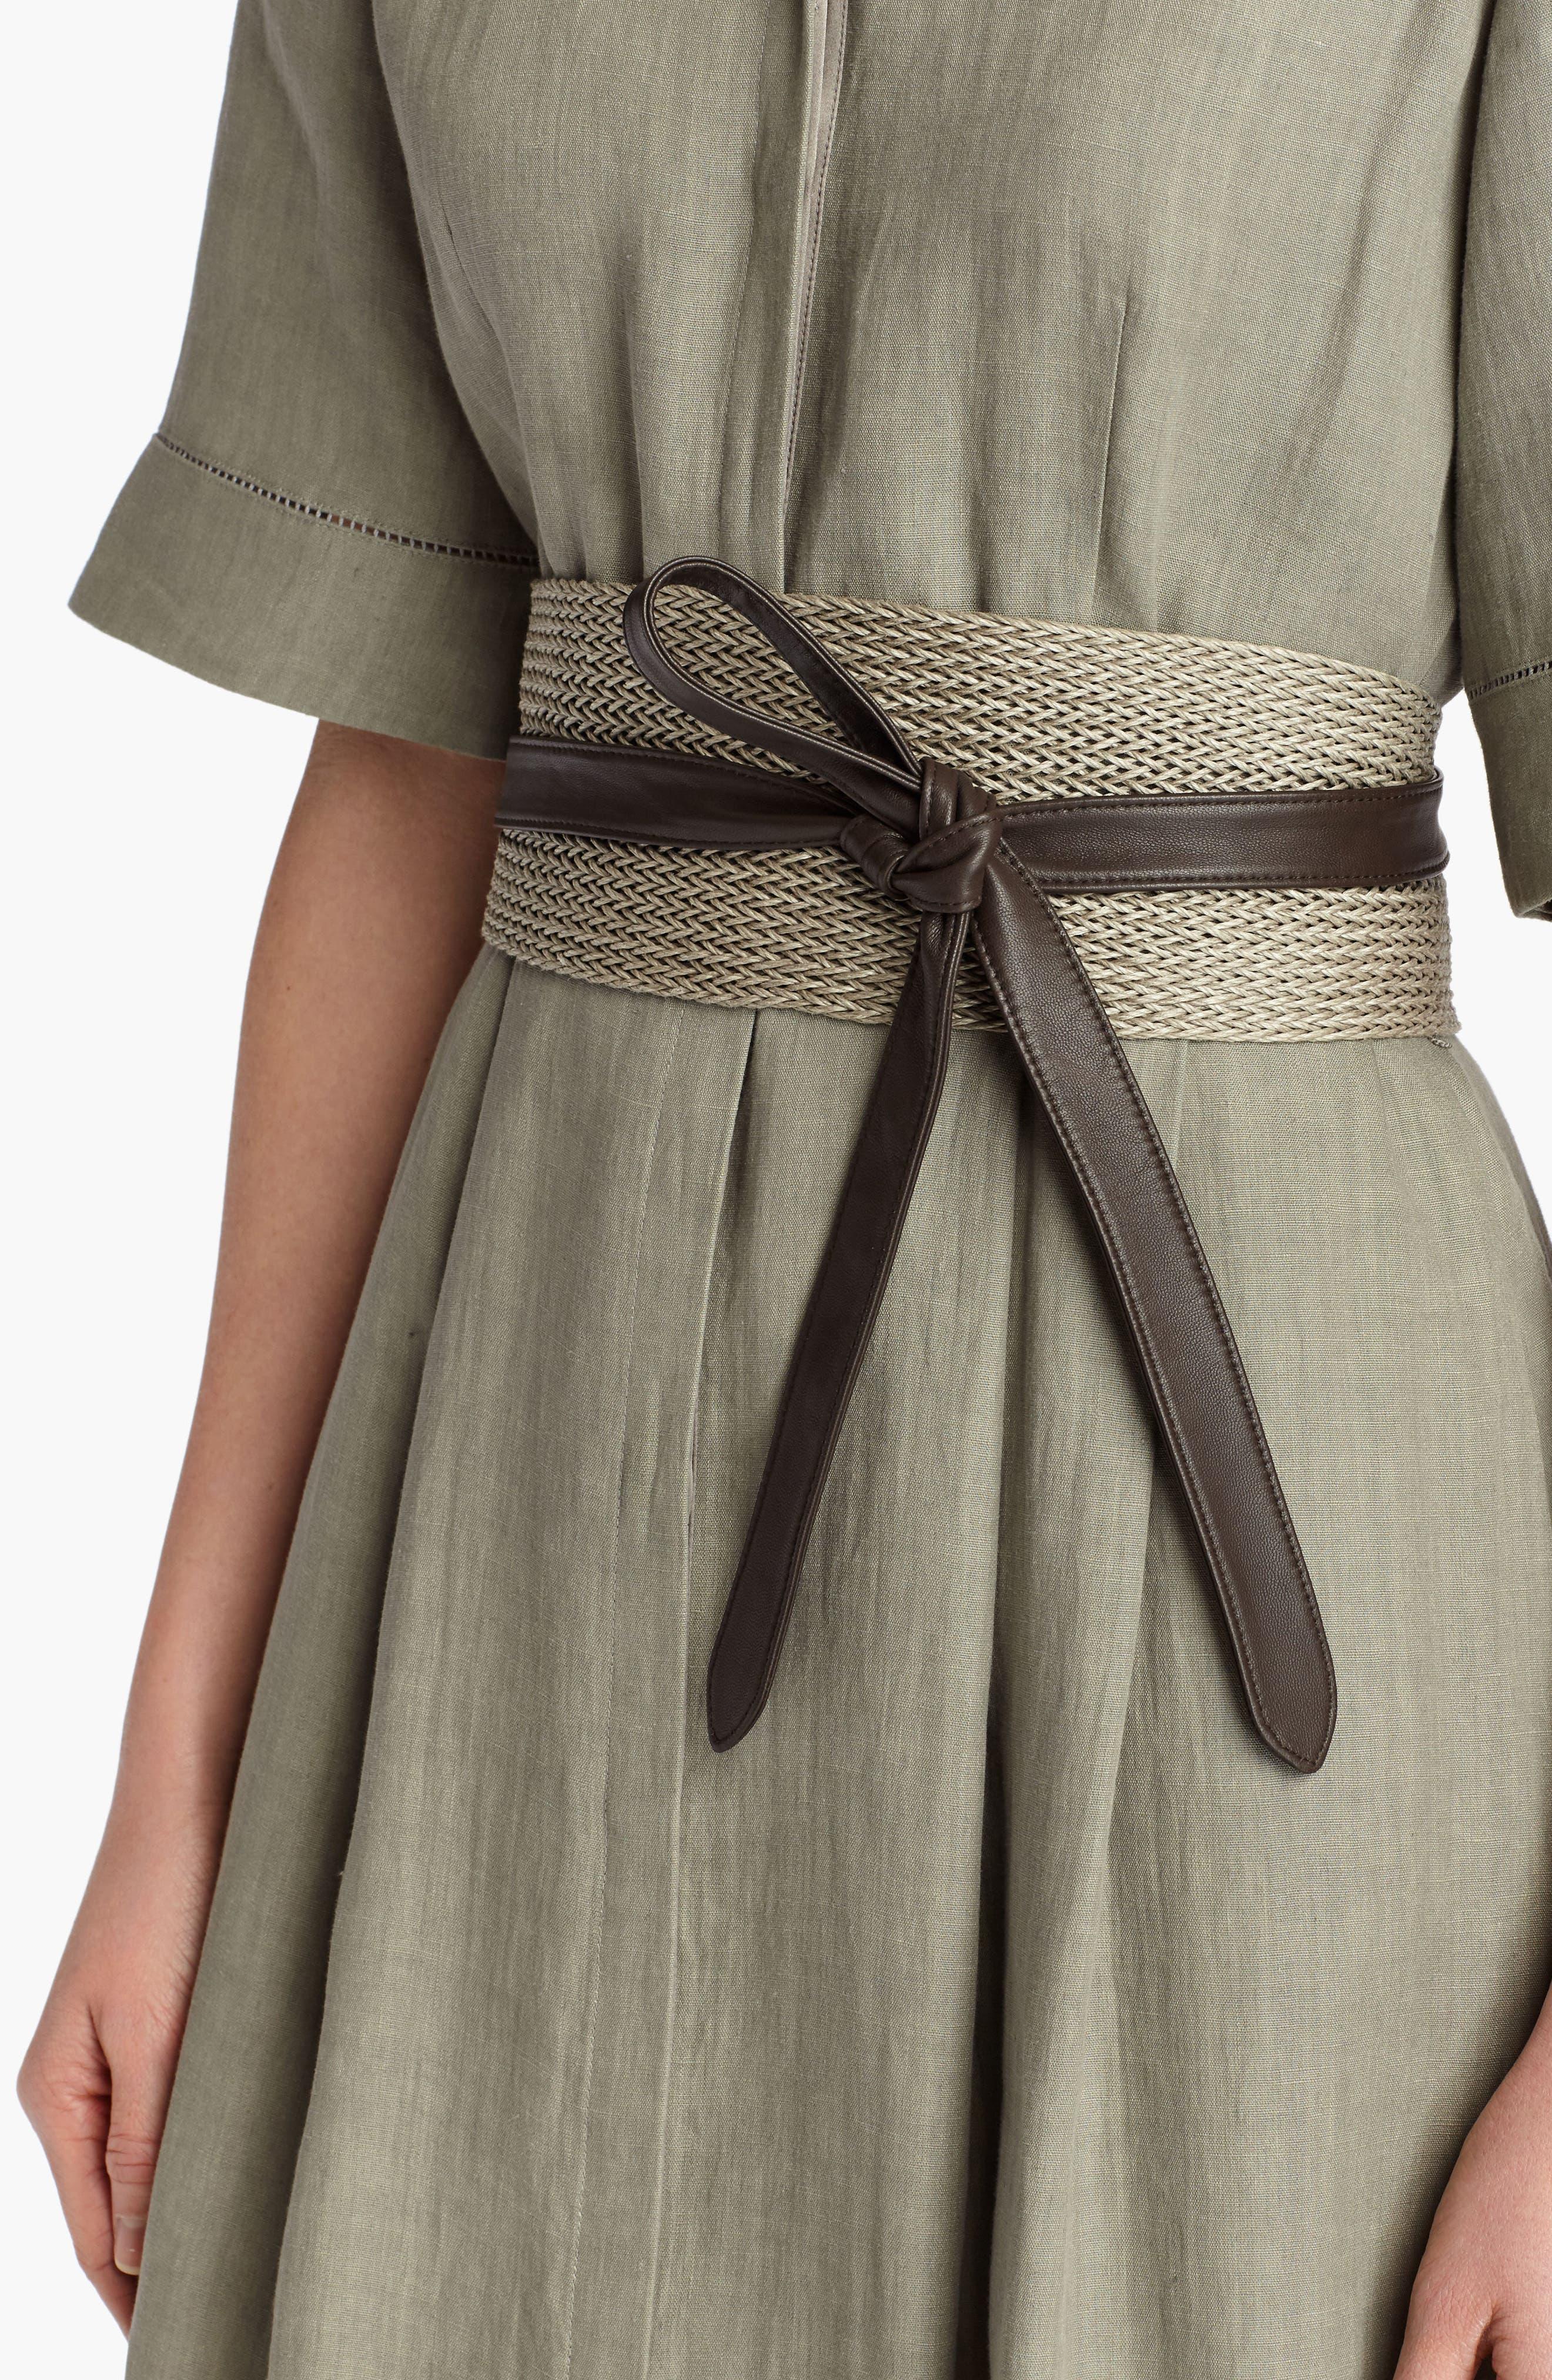 Obi Linen & Leather Belt,                             Alternate thumbnail 5, color,                             NIGHTINGALE